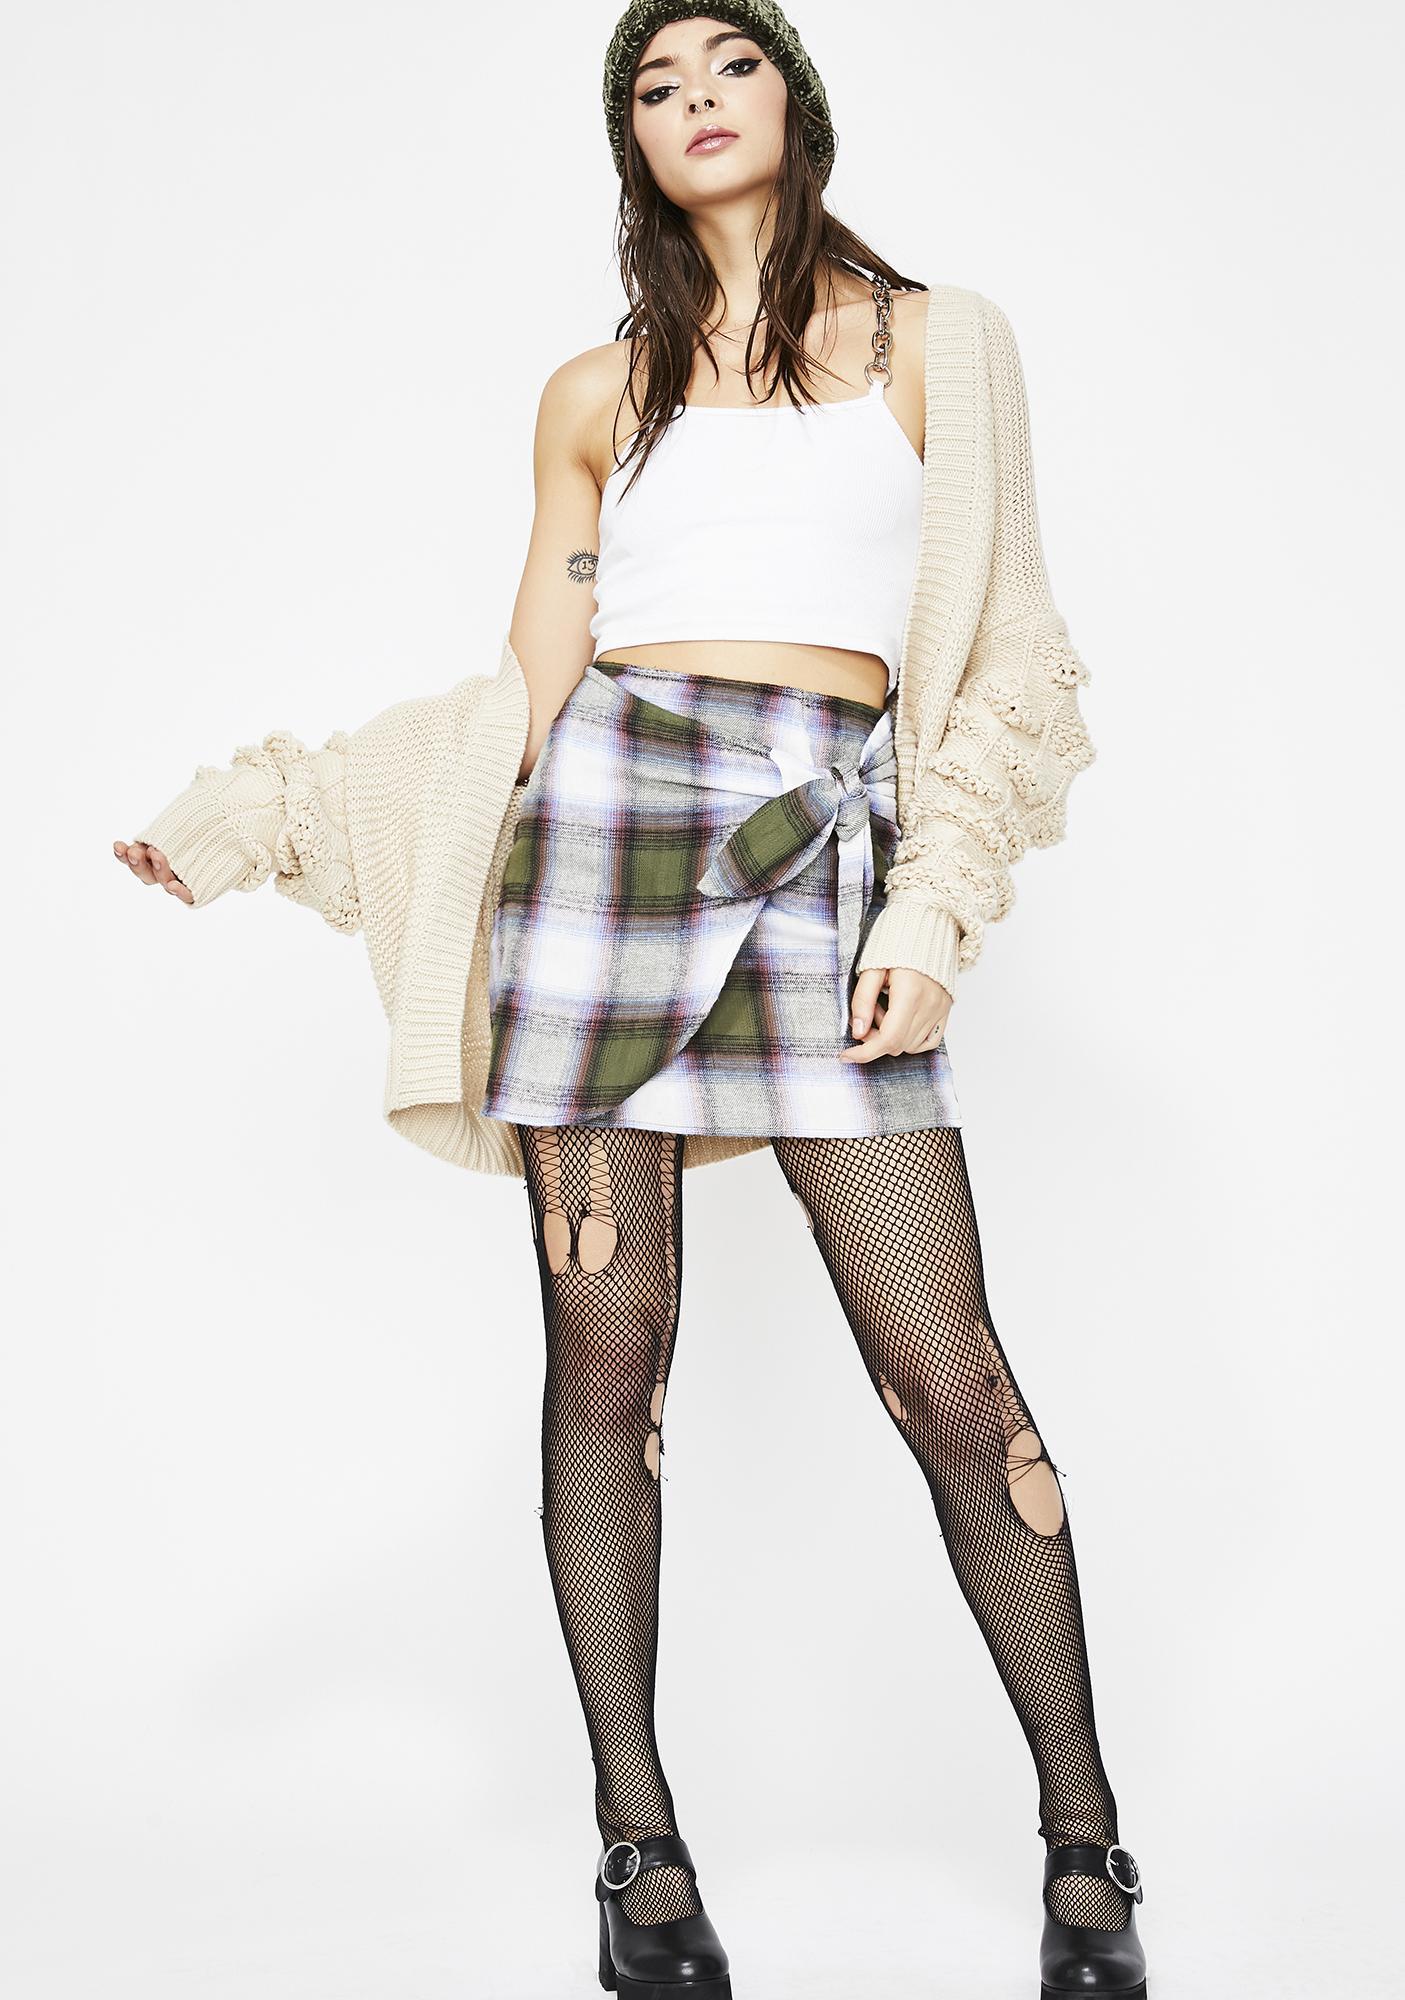 Misbehavior Goals Plaid Skirt